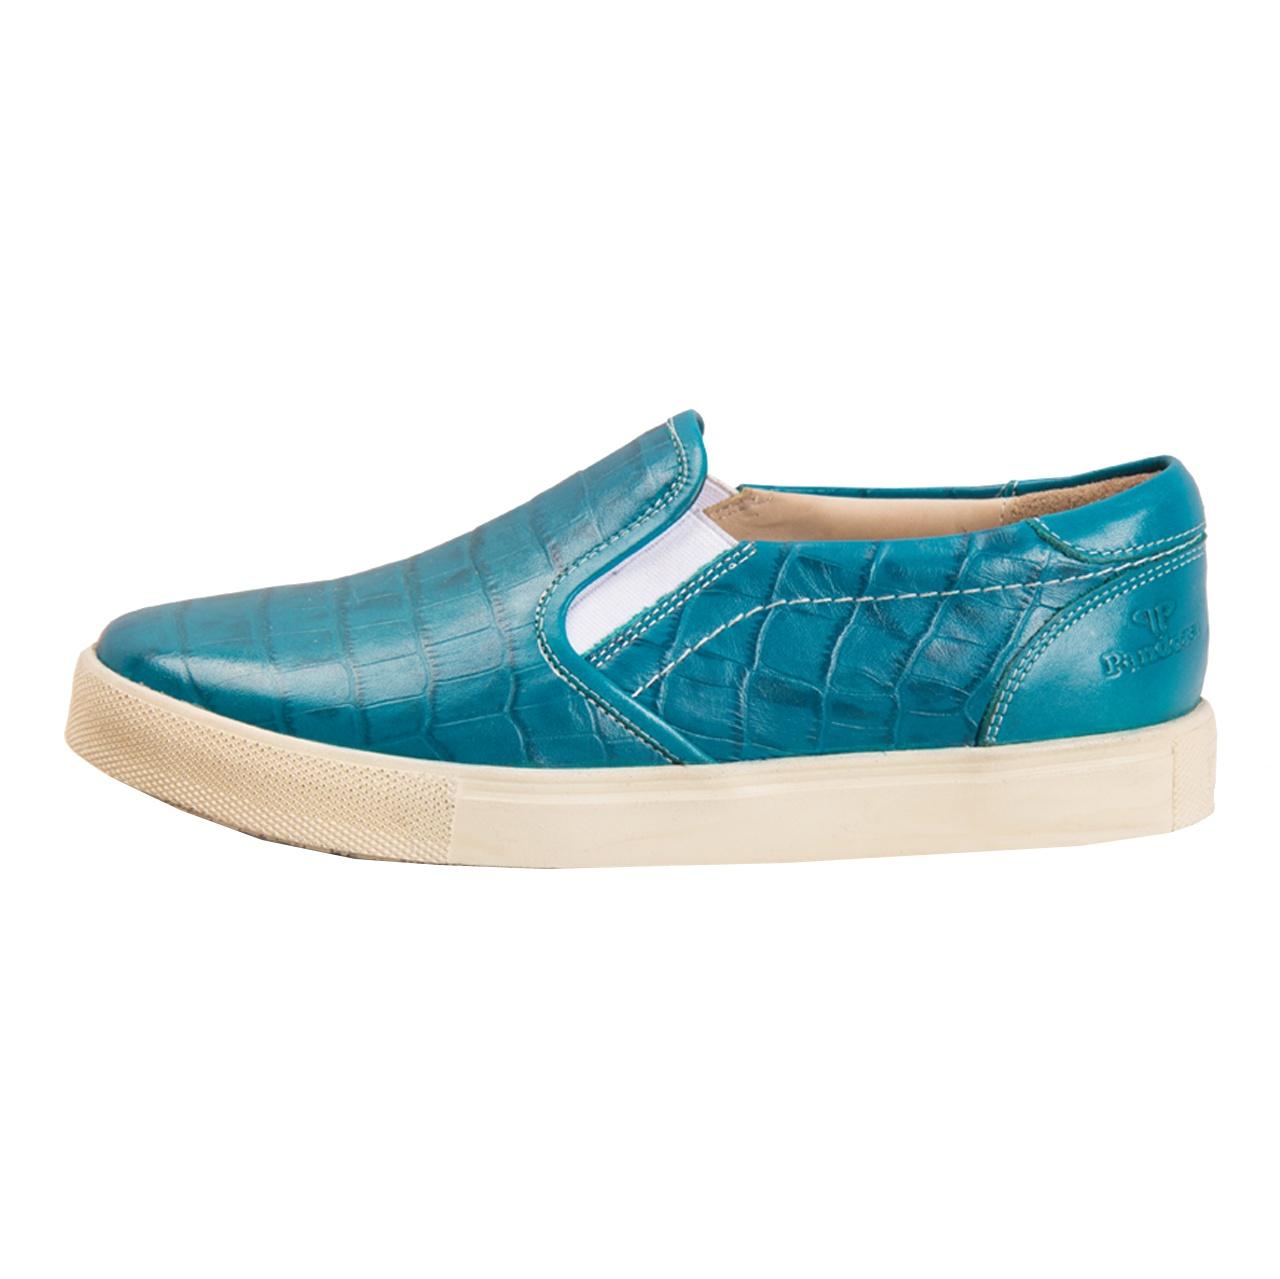 کفش زنانه پاندورا مدل W450-turquoise